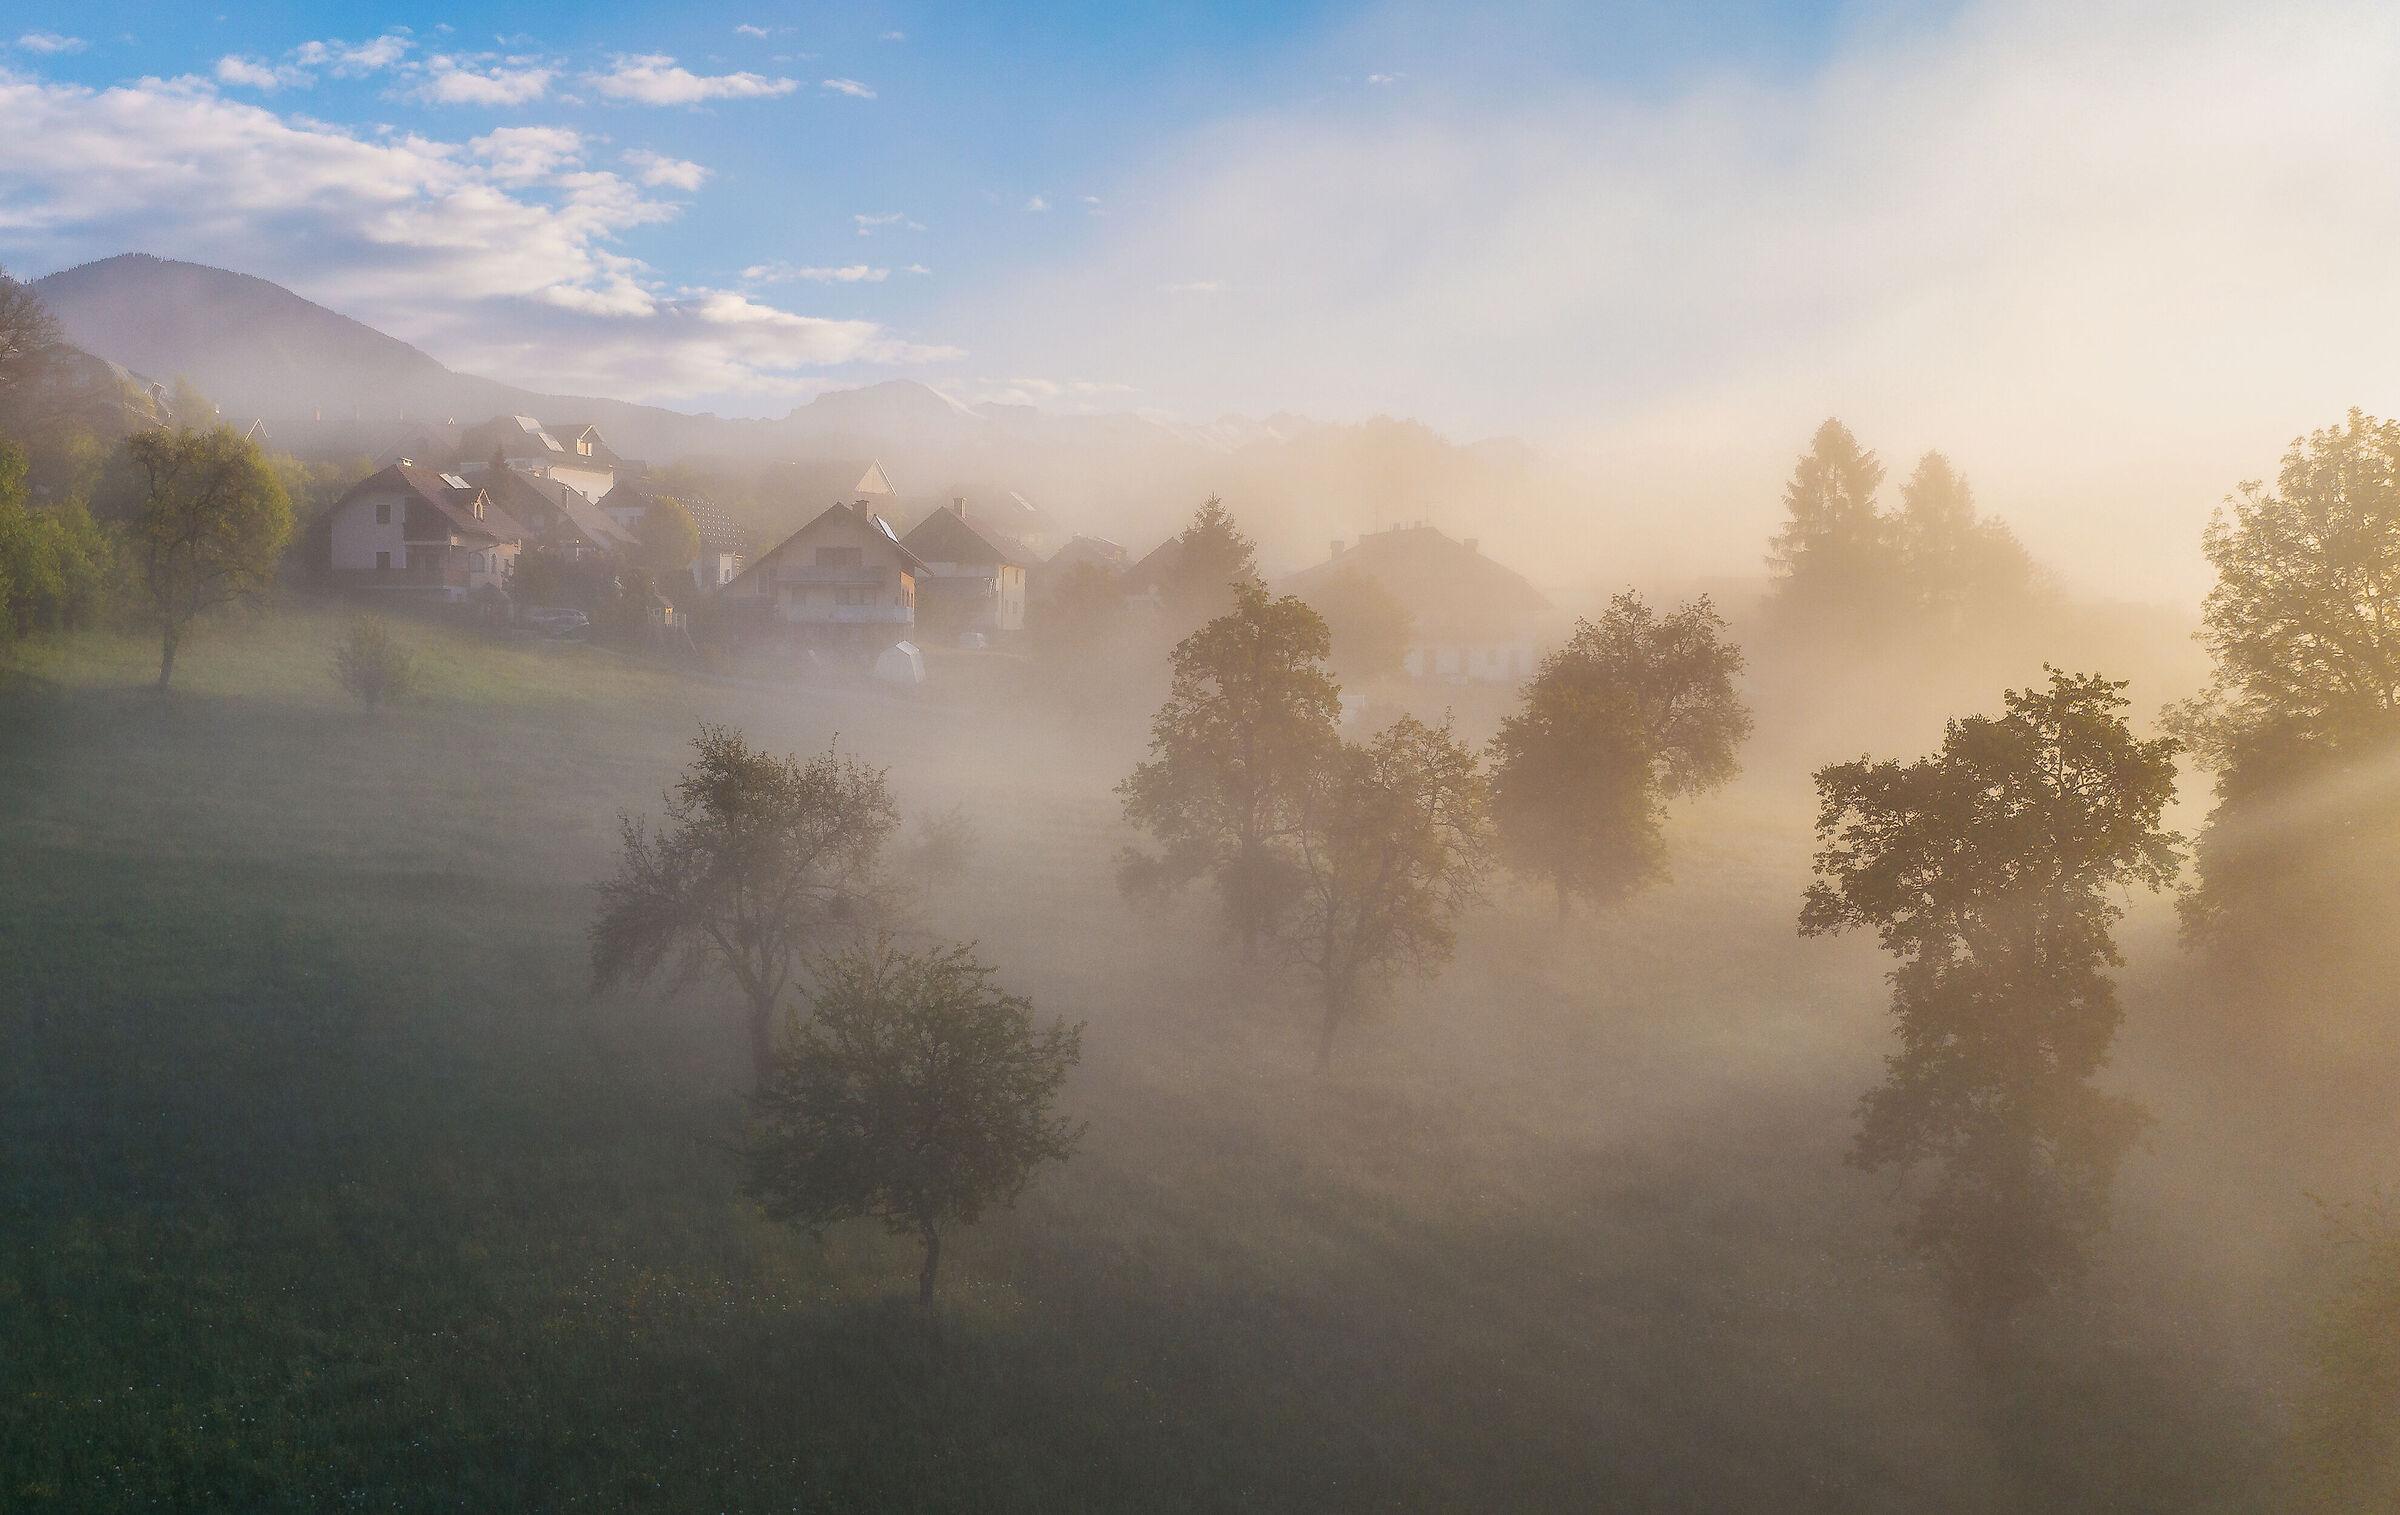 Morning light in the village...